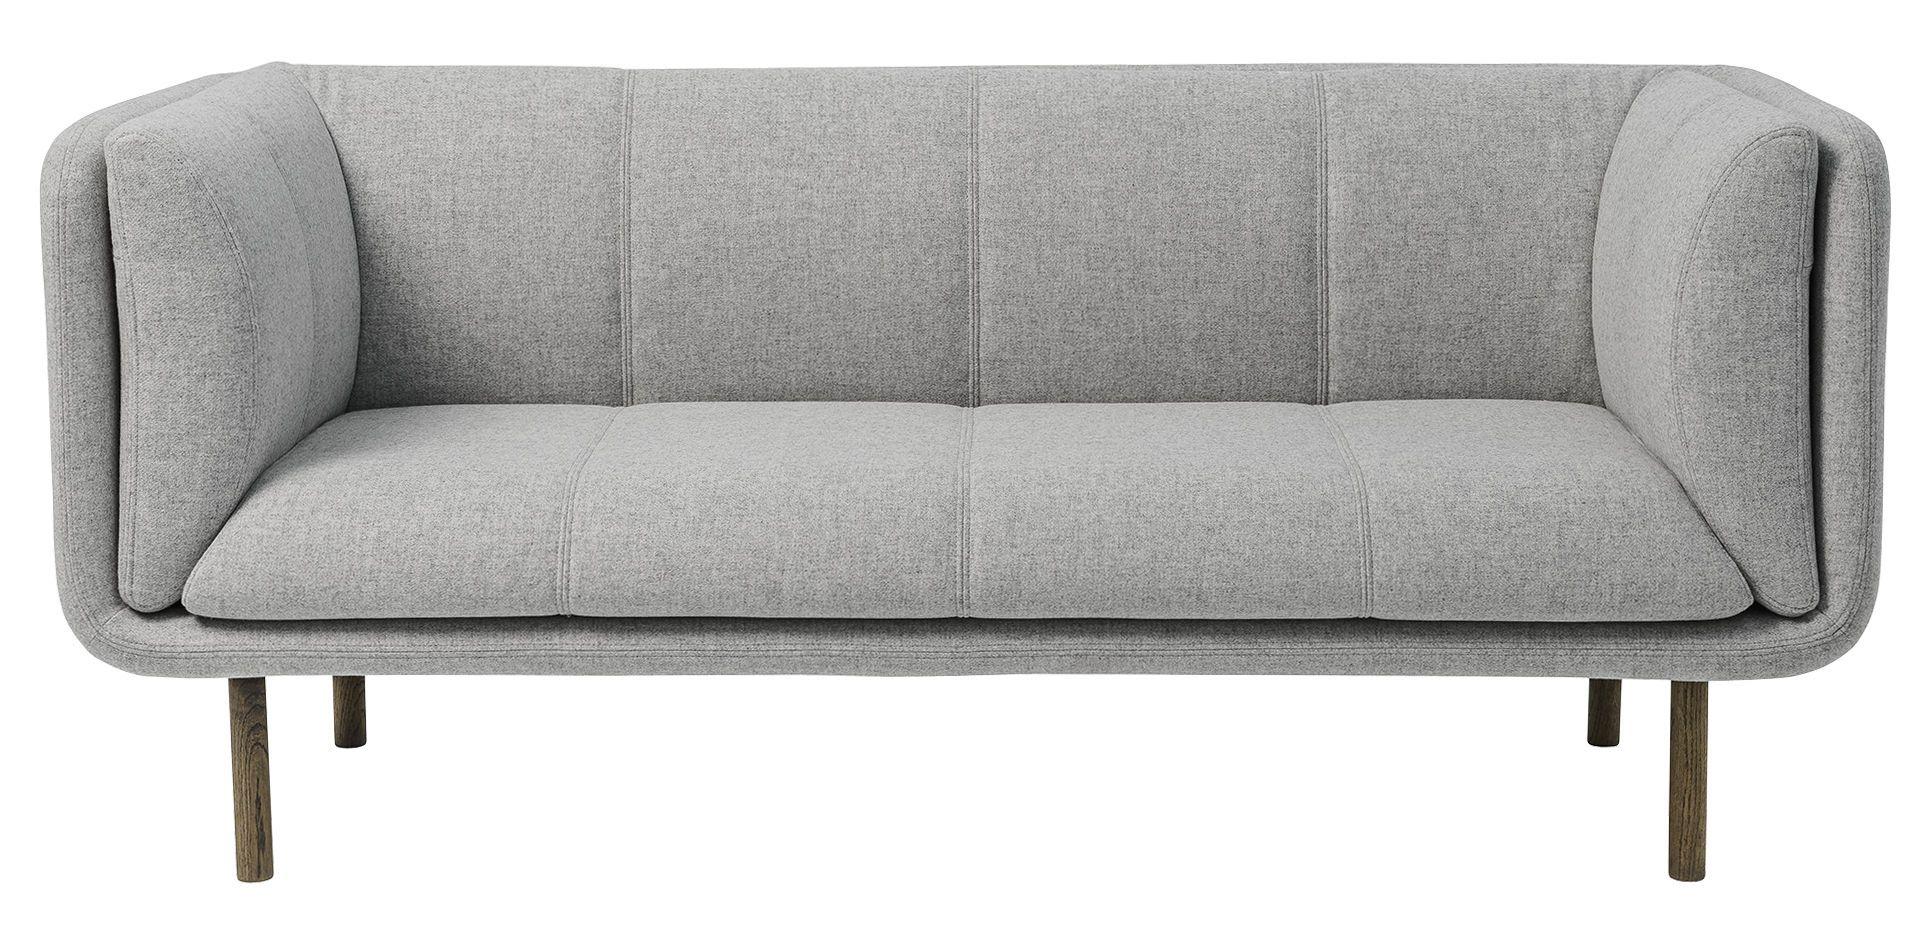 Stay Sofa 2 5 Sitzer L 192 Cm Bloomingville Sofa Sofa Billig Sofa Design